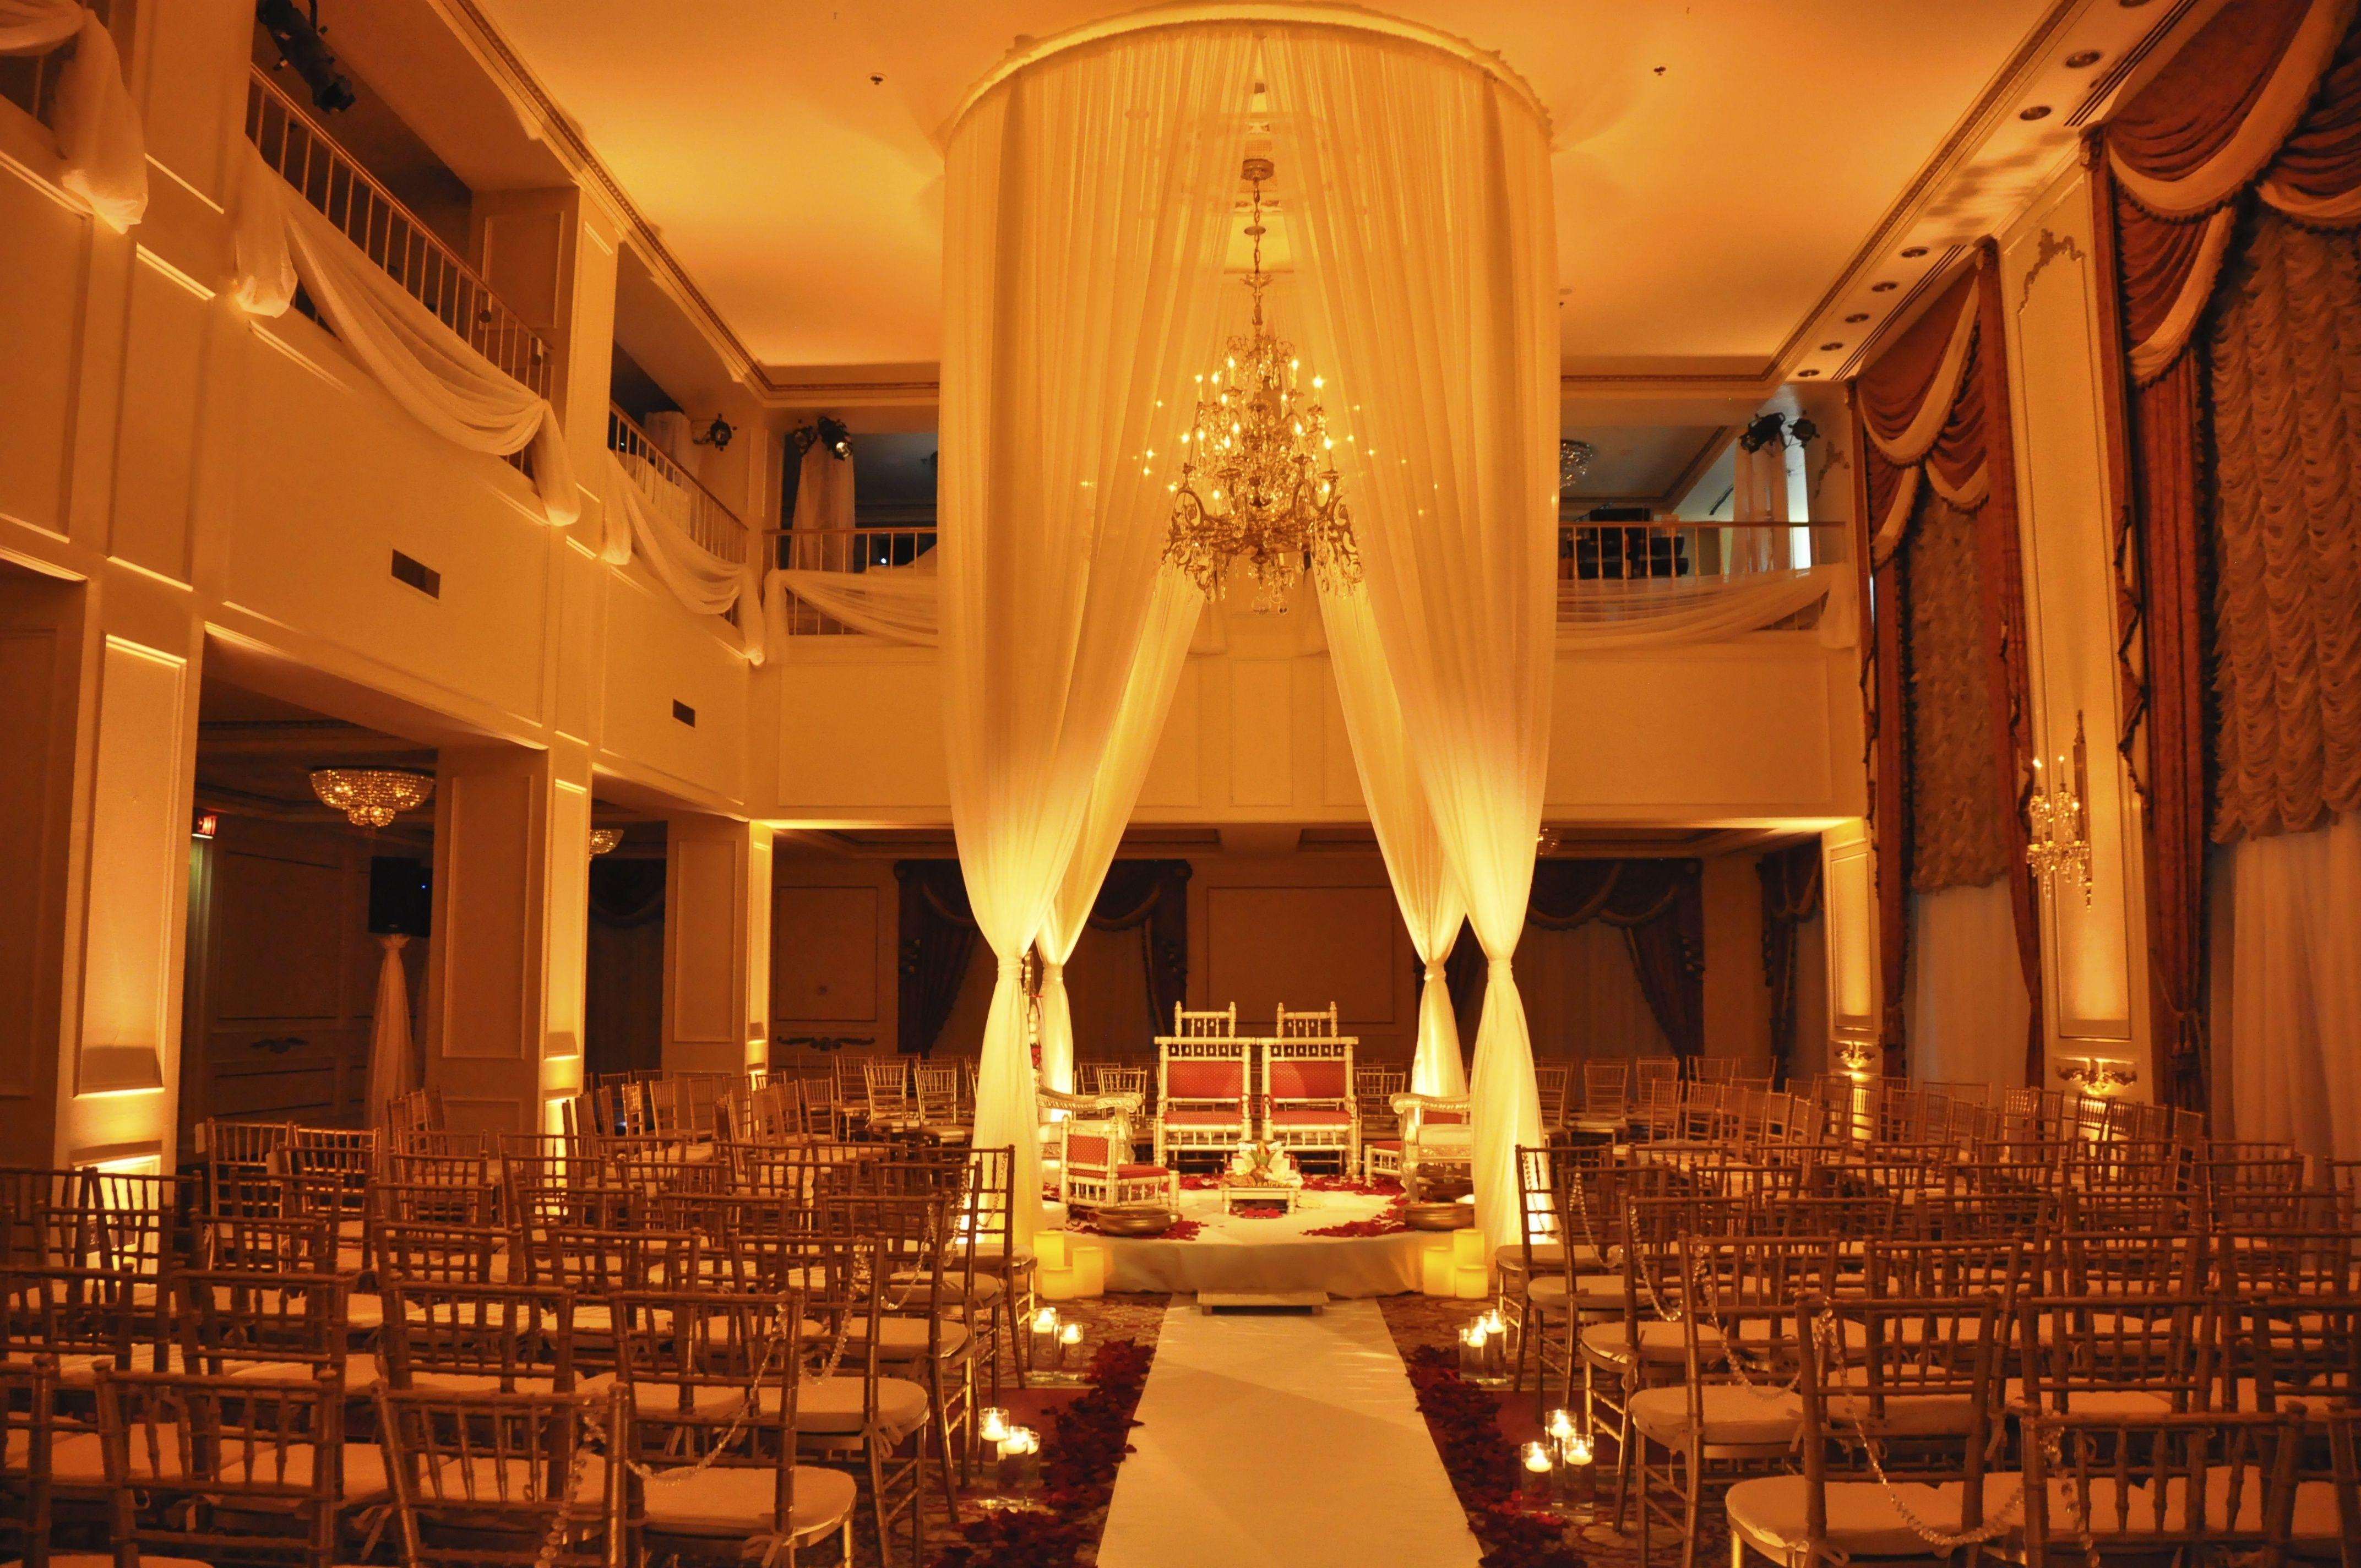 Wedding mandap decoration images  Pin by M on Wedding  Pinterest  Wedding and Weddings